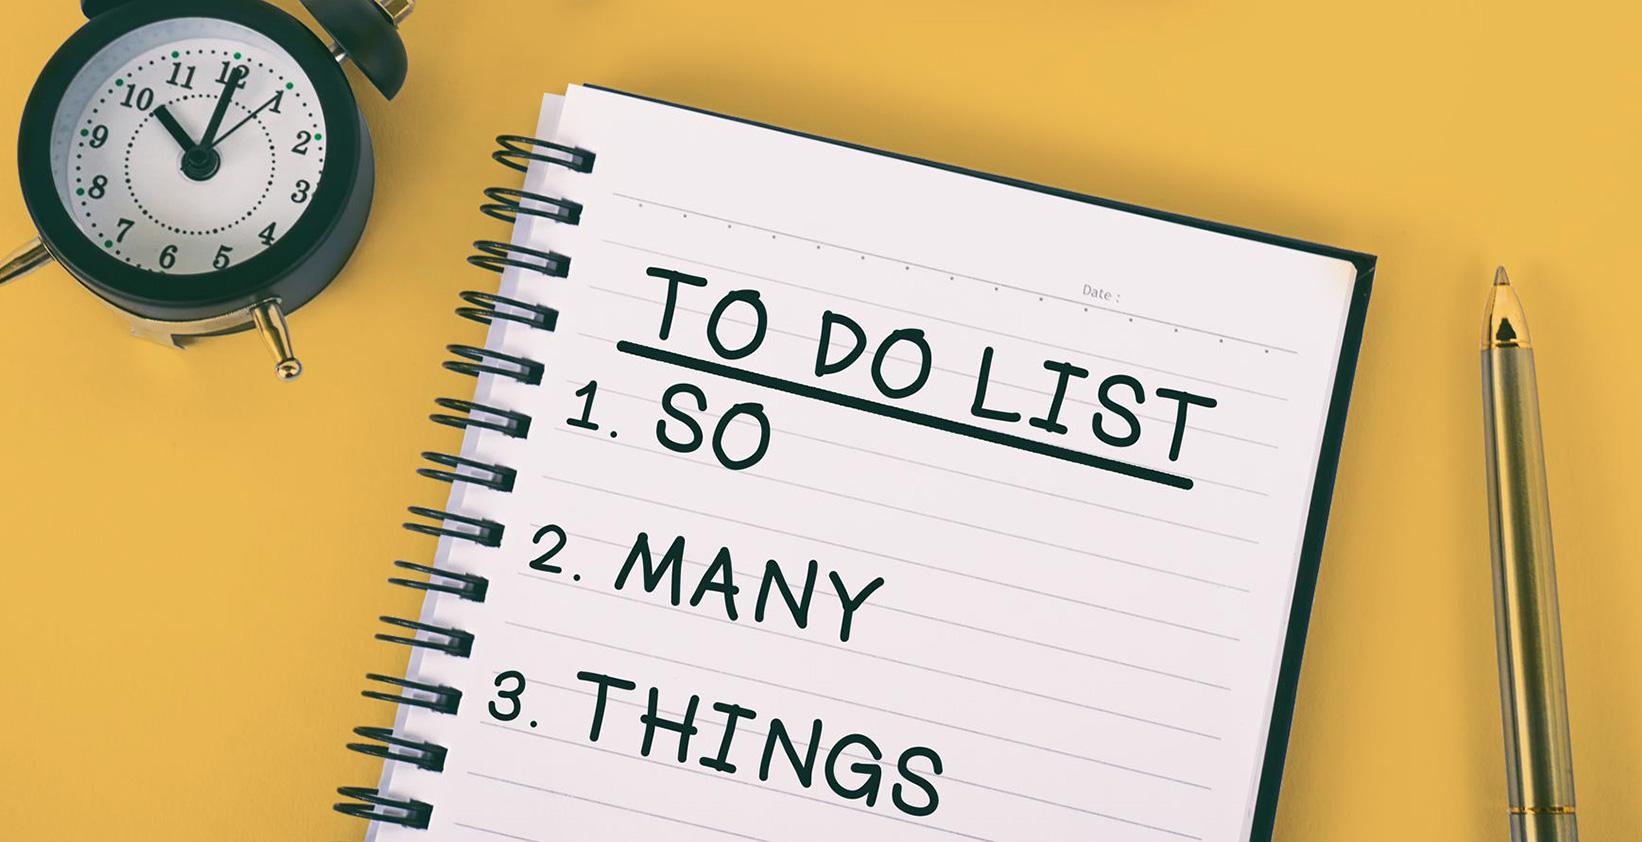 DT 29052 | Big Dave's Crossword Blog